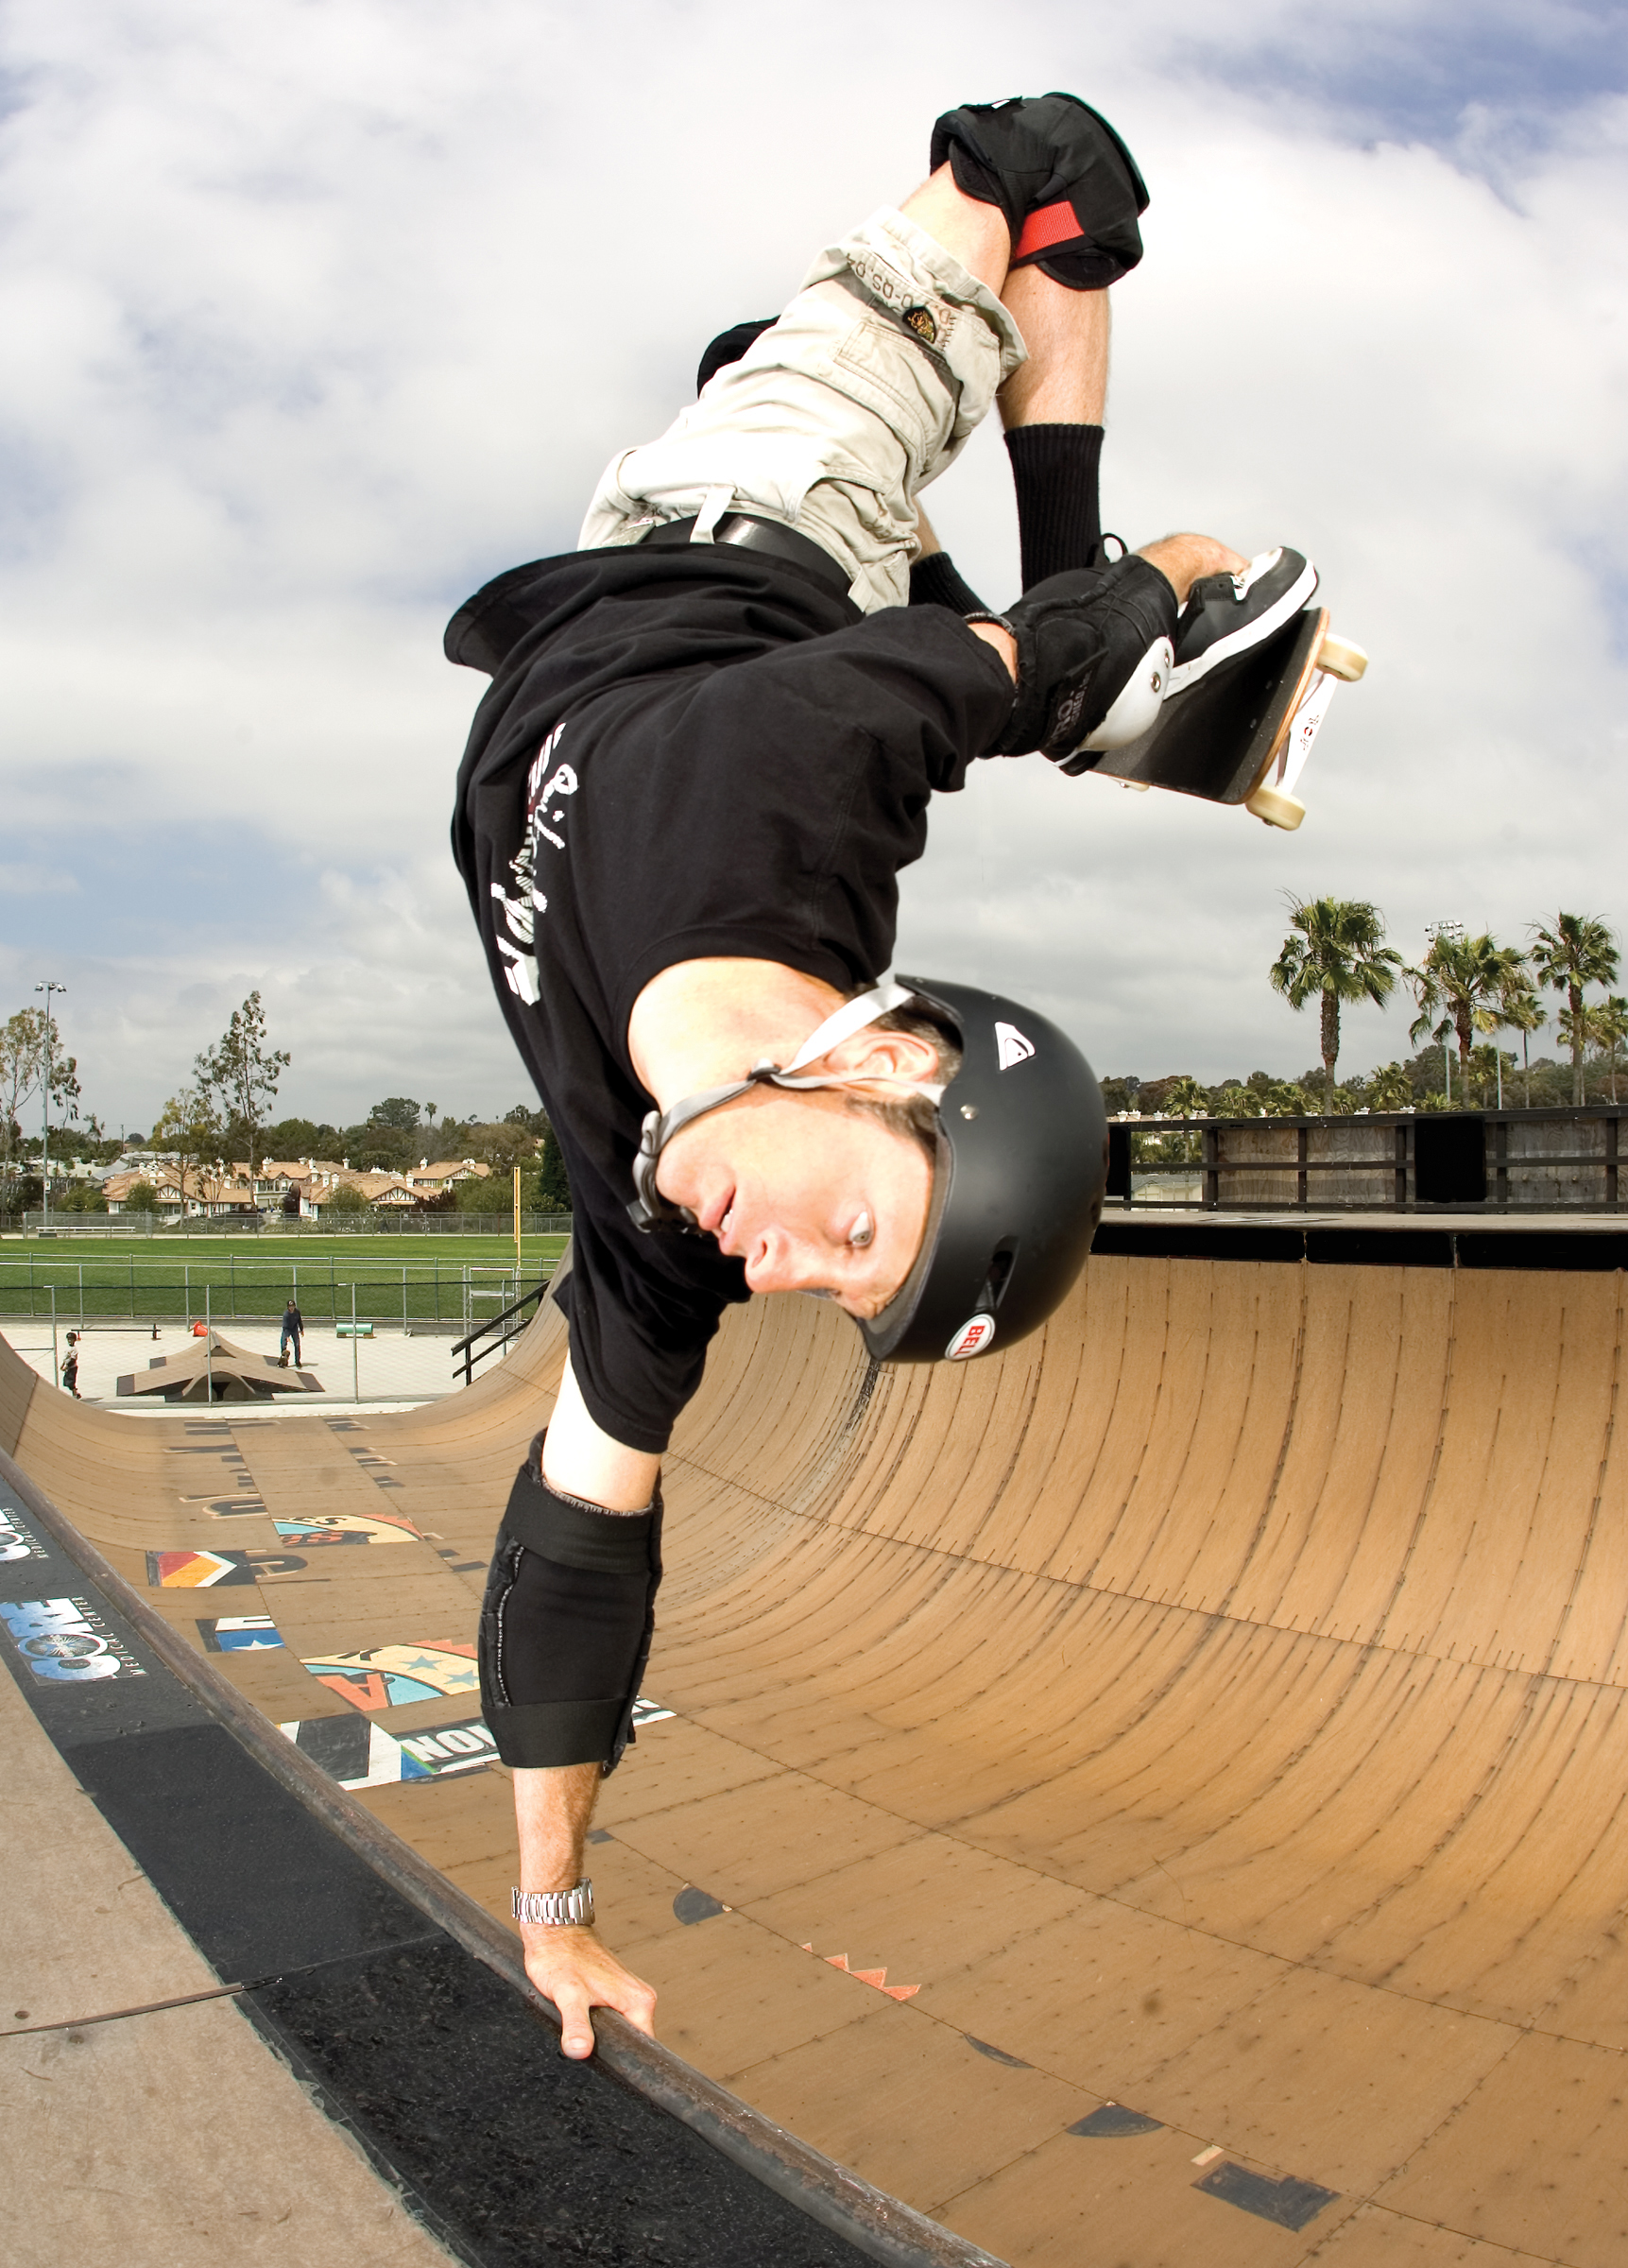 Kid Skate Movie